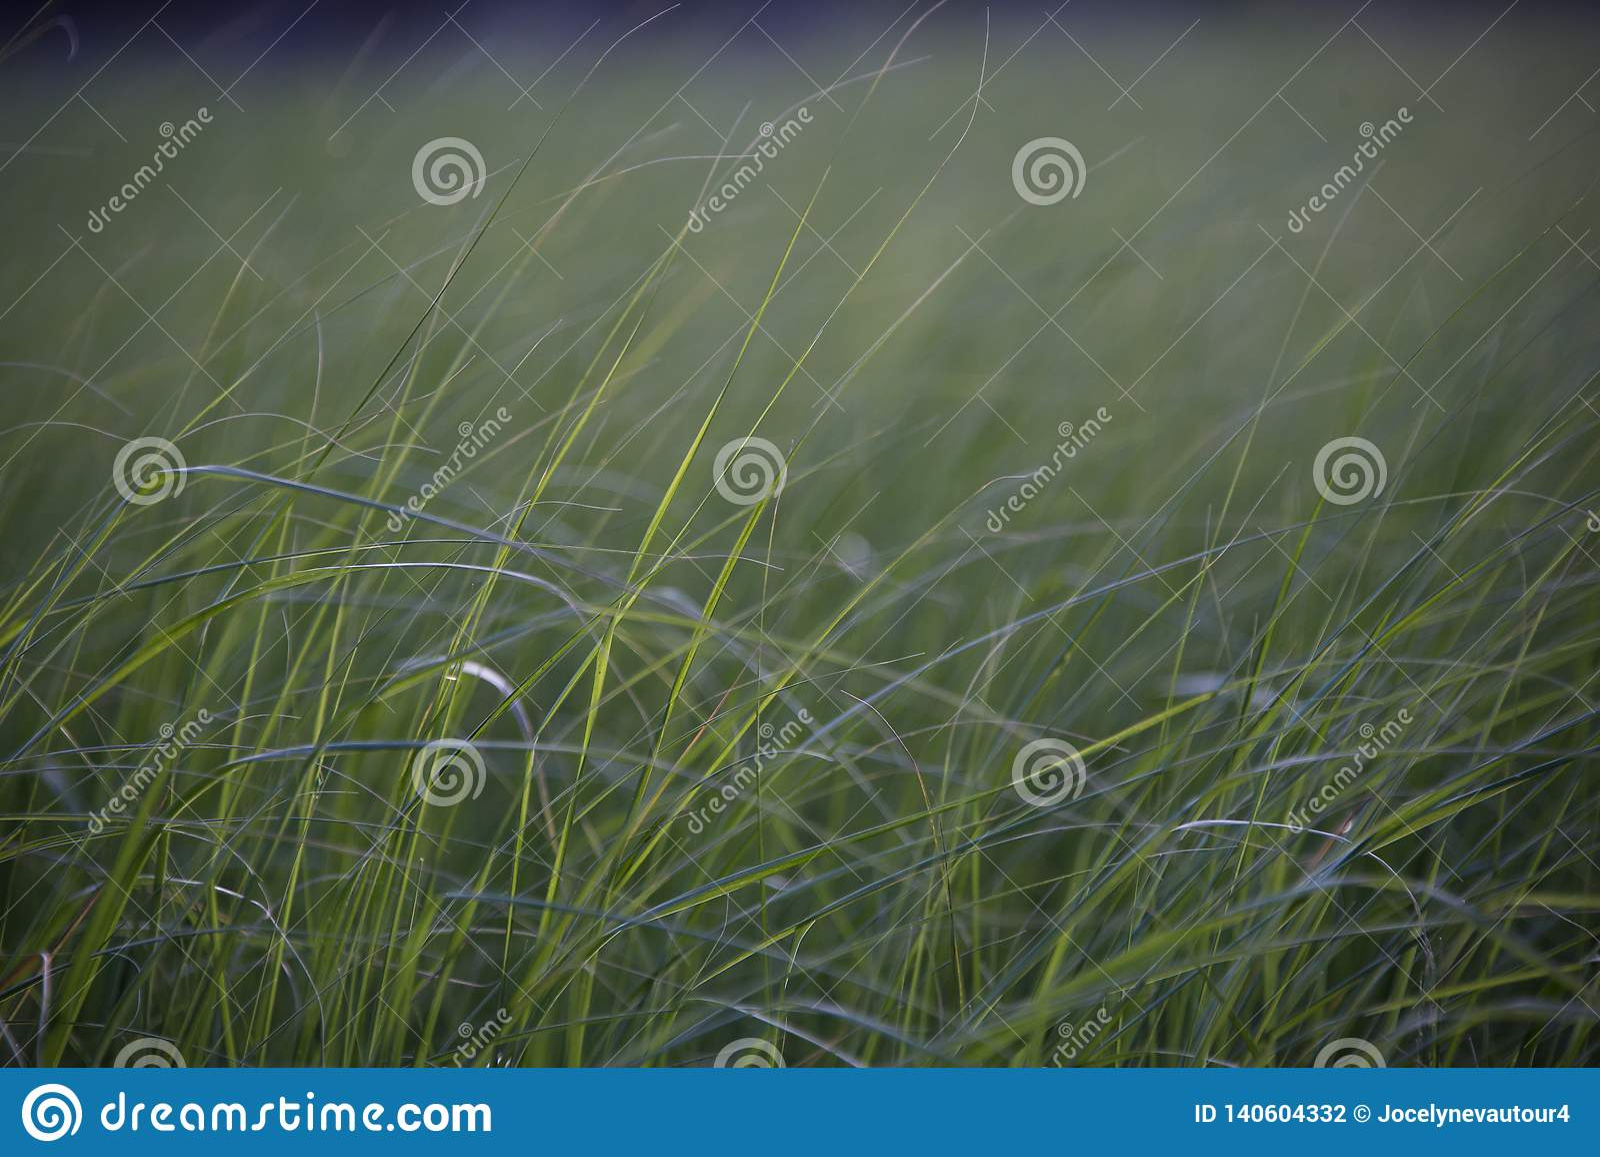 Tall grass in a meadow near a pond